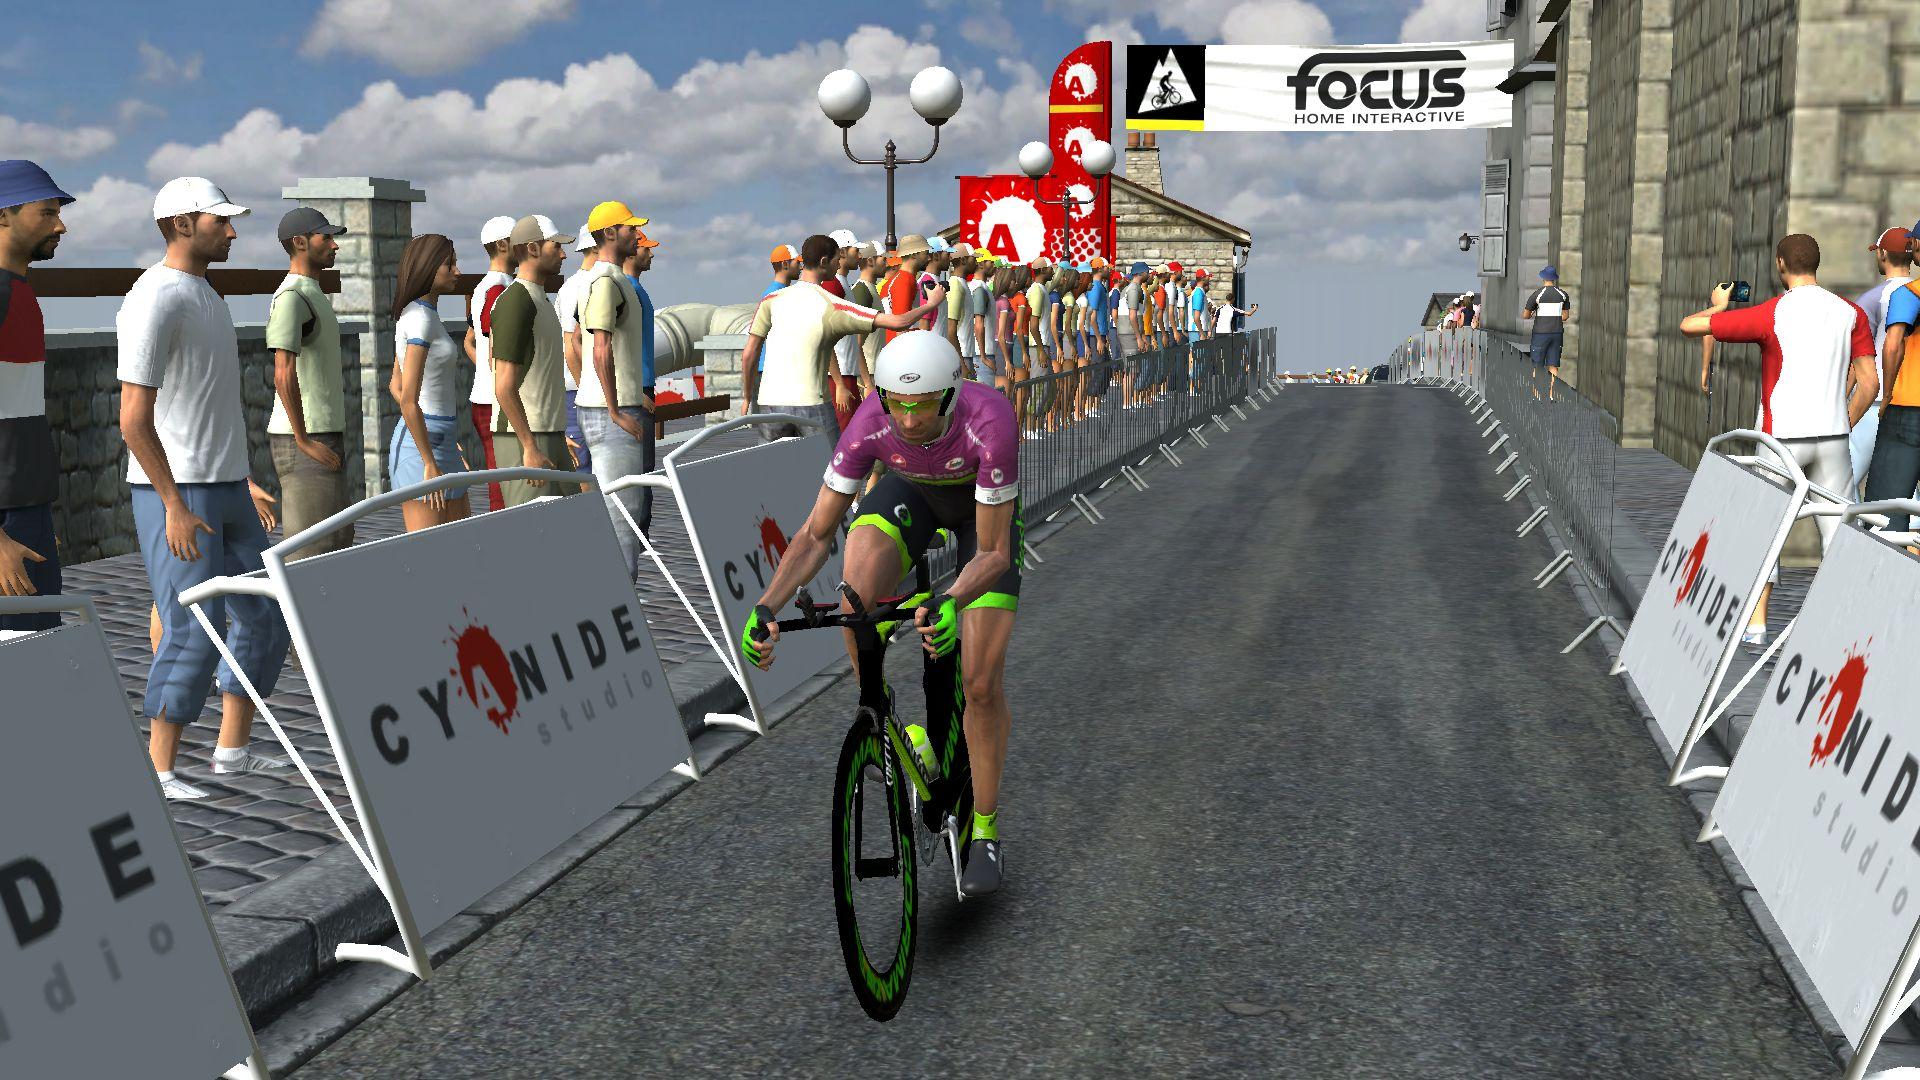 pcmdaily.com/images/mg/2019/Races/GTM/Giro/mg19_giro_09_PCM0068.jpg